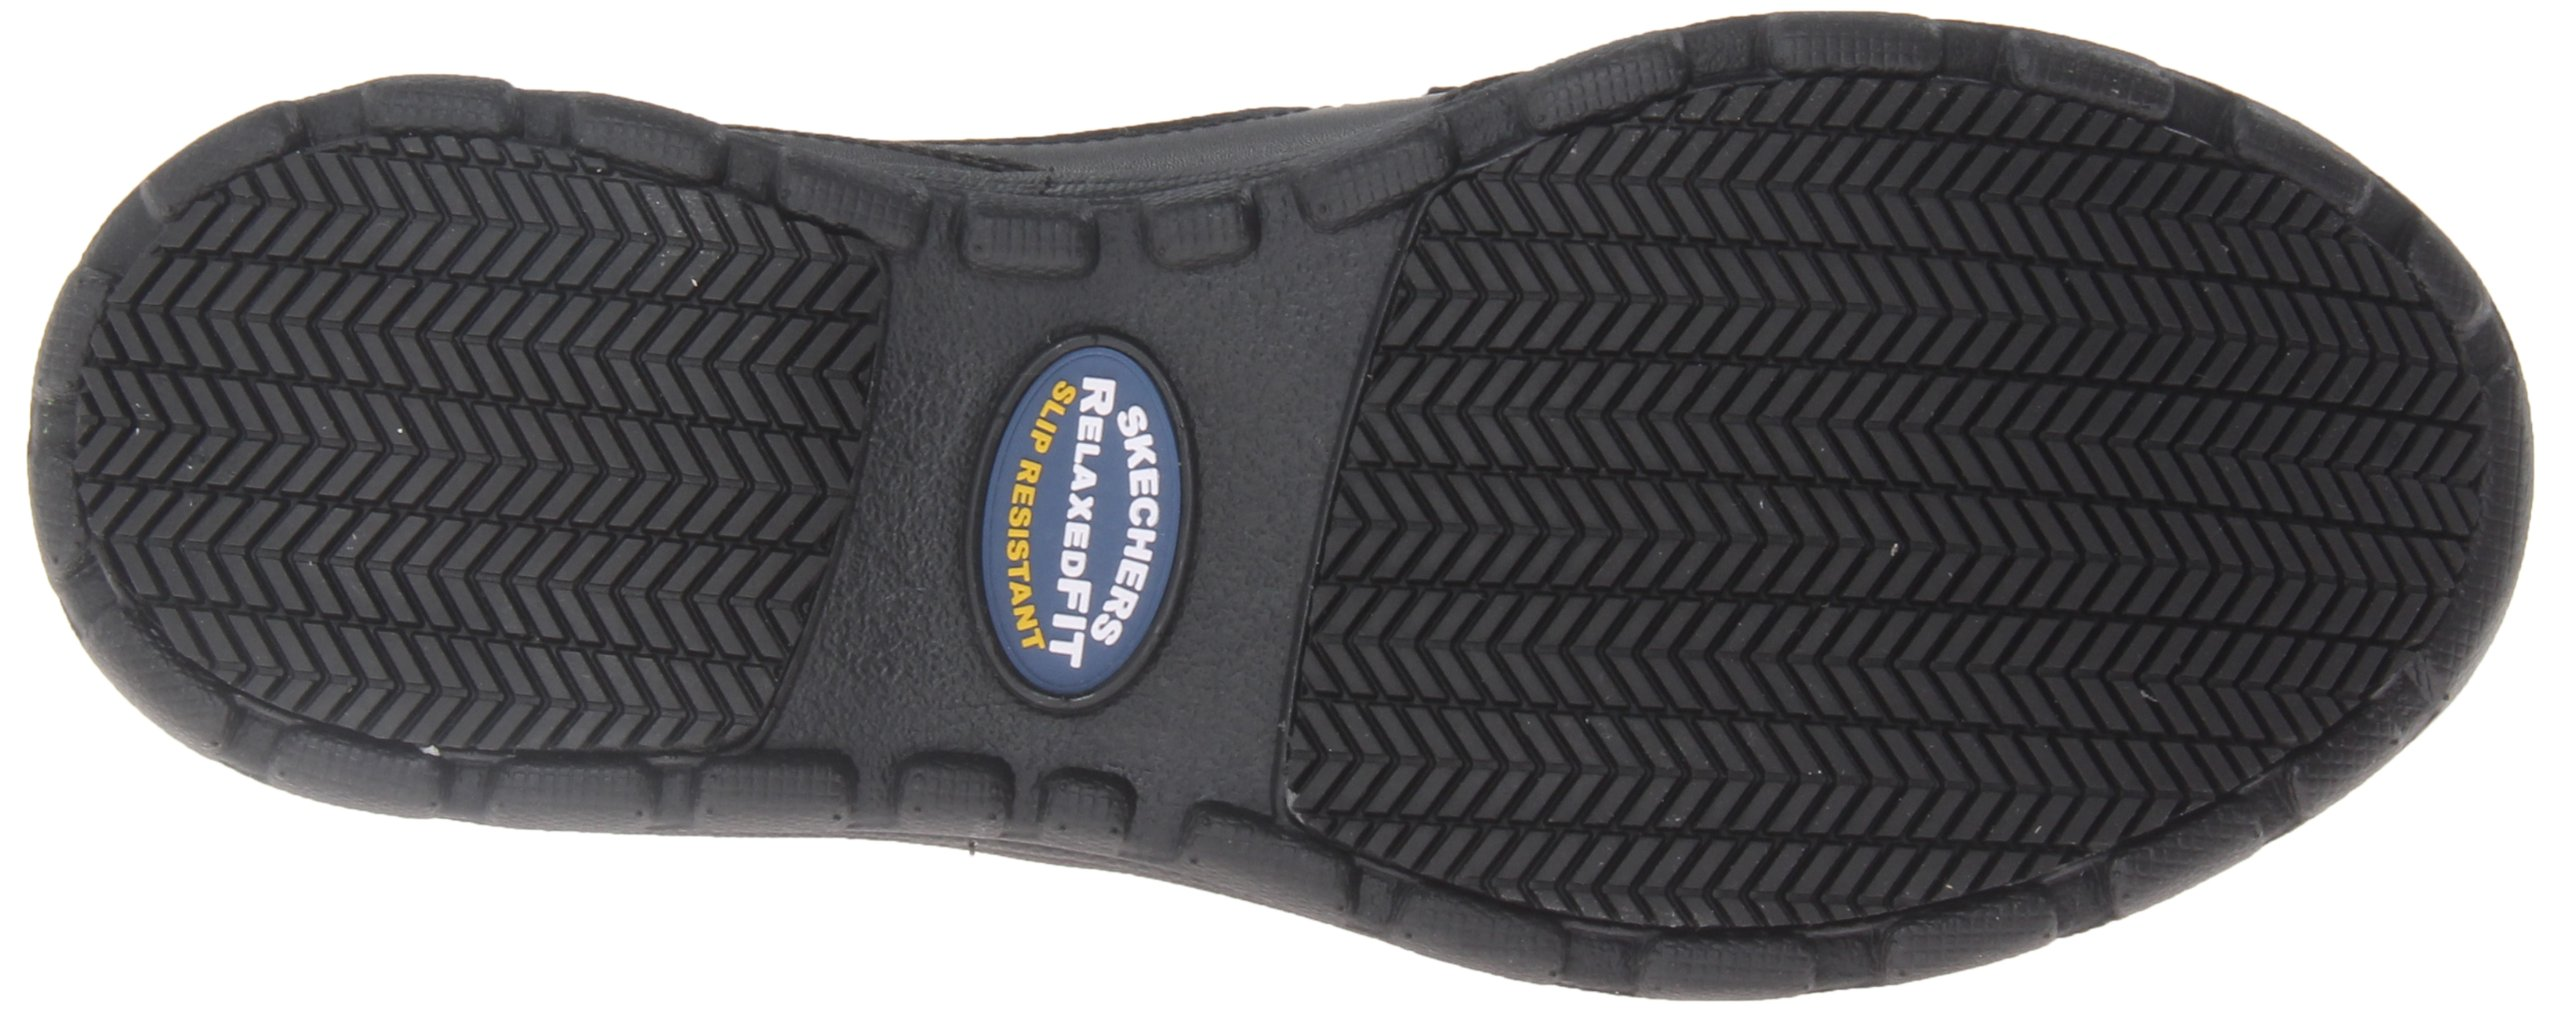 Skechers for Work Men's Hobbes Relaxed Fit Slip Resistant Work Shoe, Black, 11.5 M US by Skechers (Image #3)